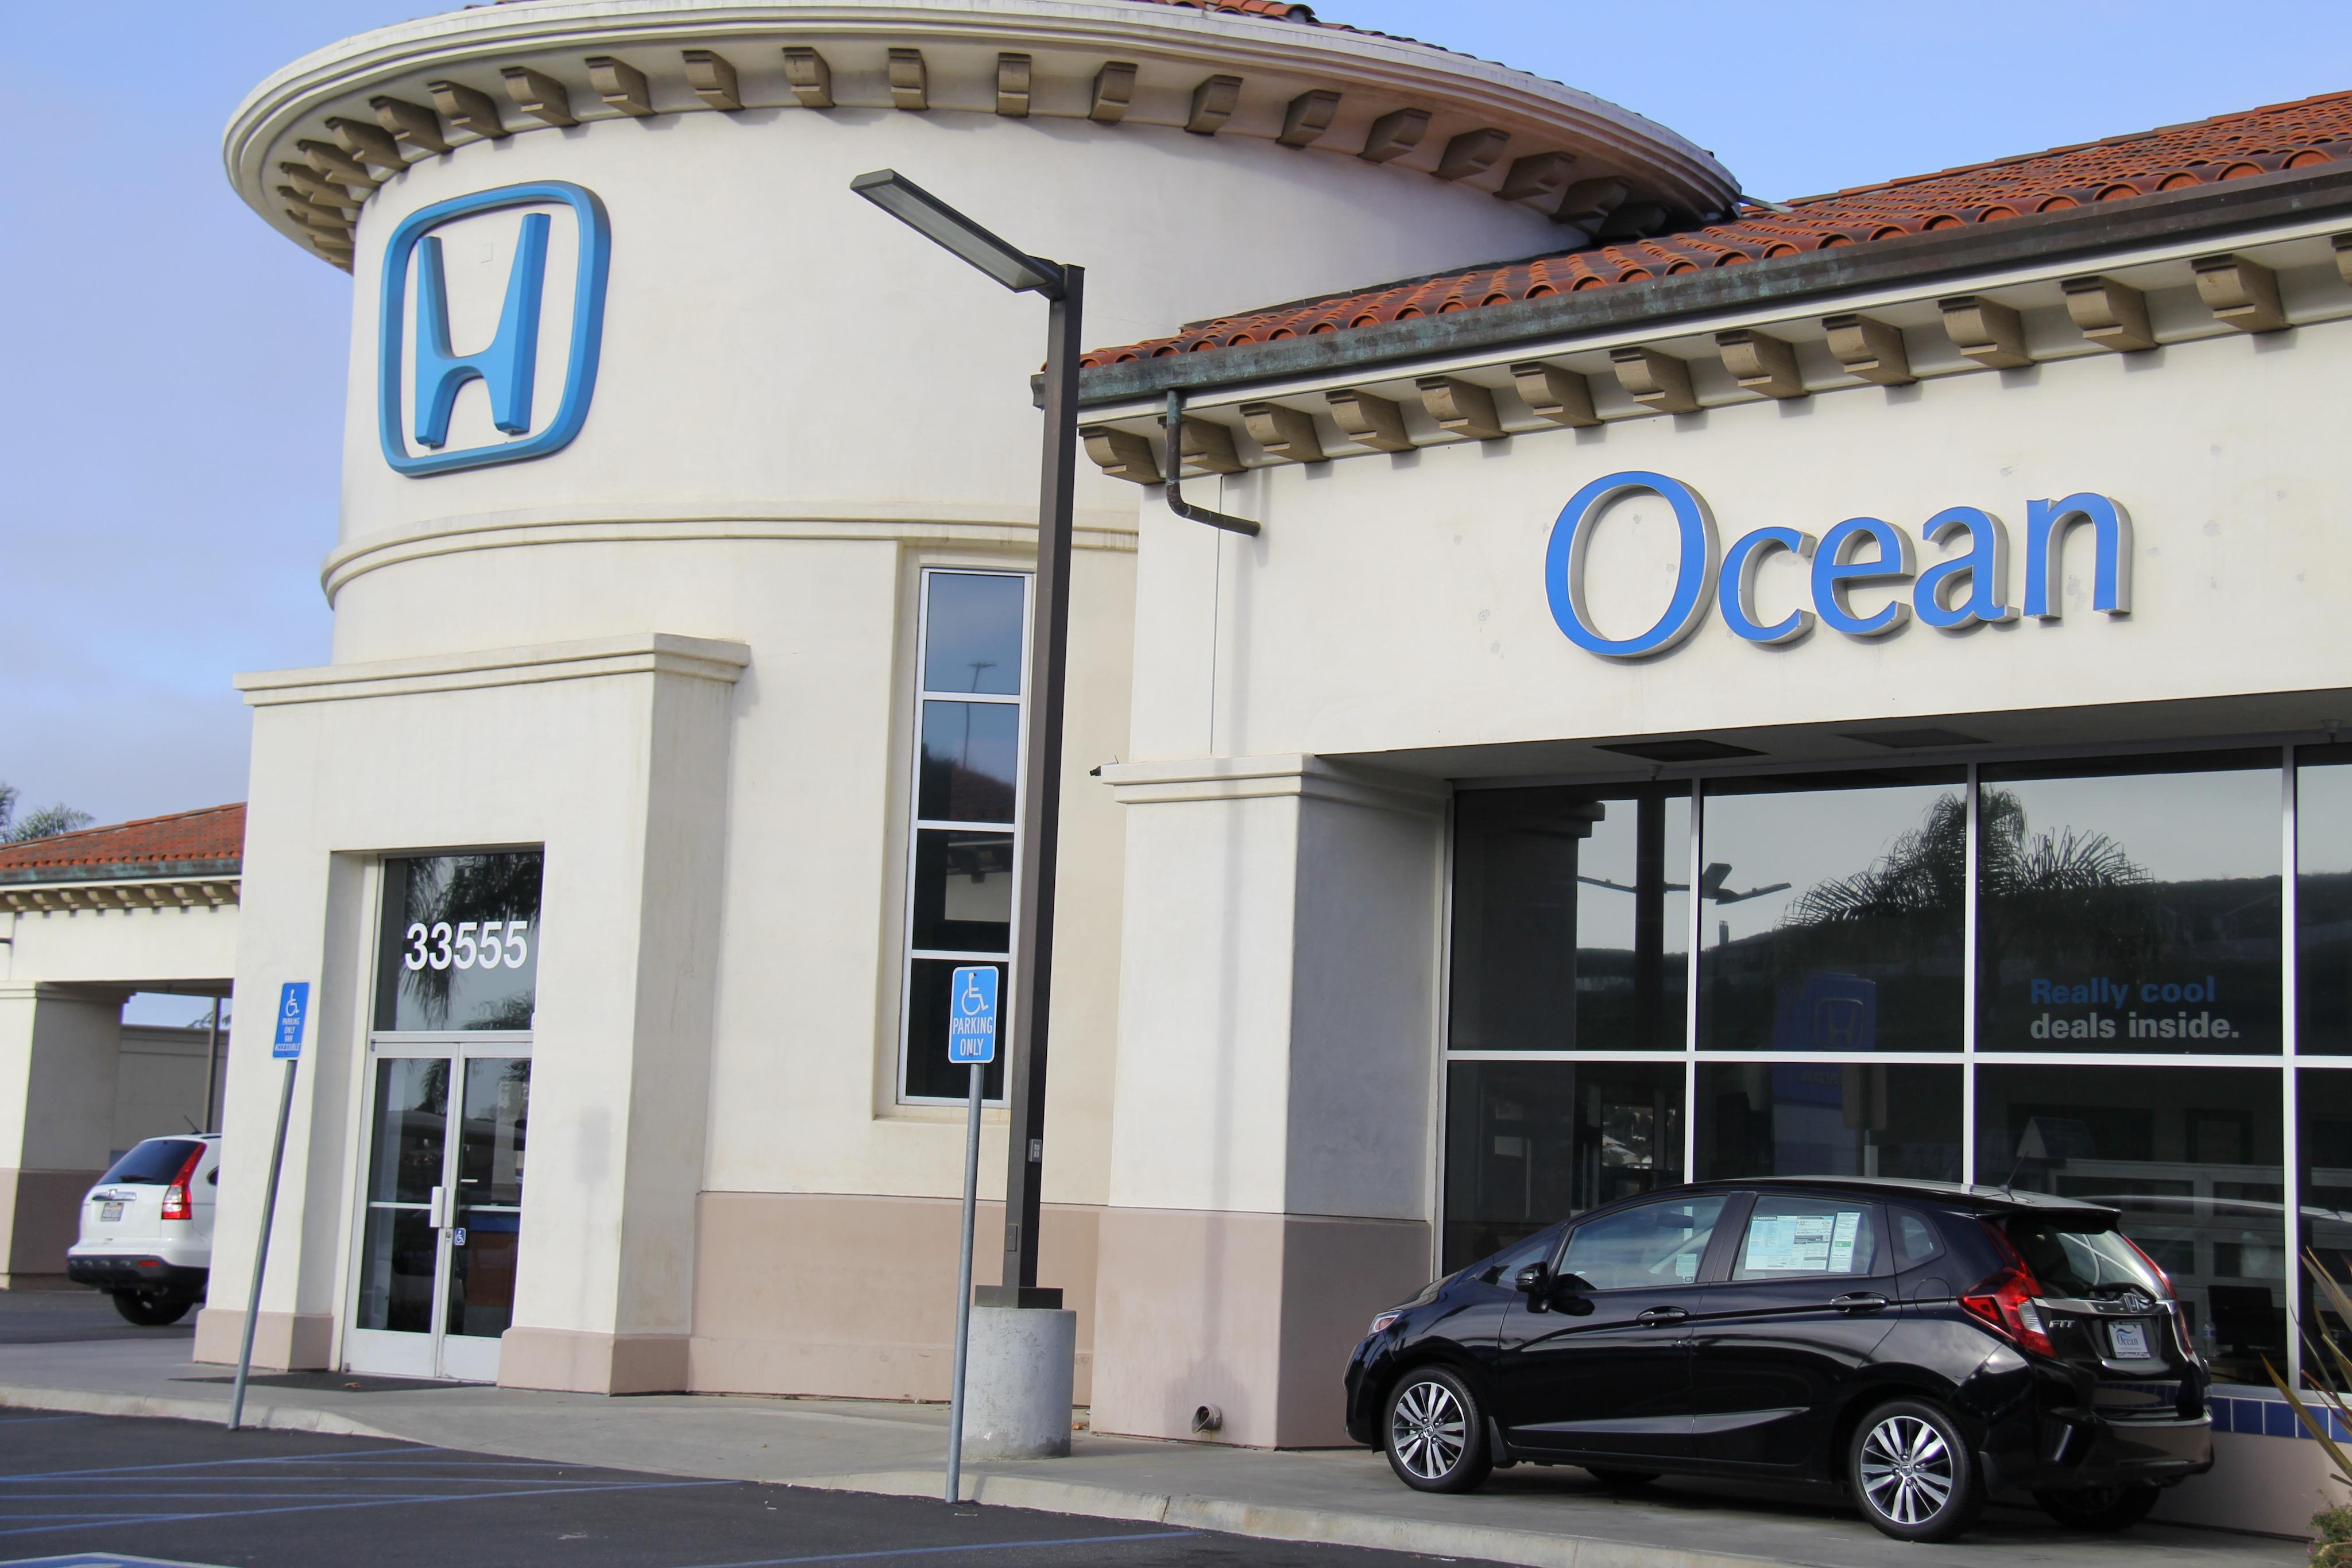 Honda dealer orange county ca new honda certified used for Ocean honda service